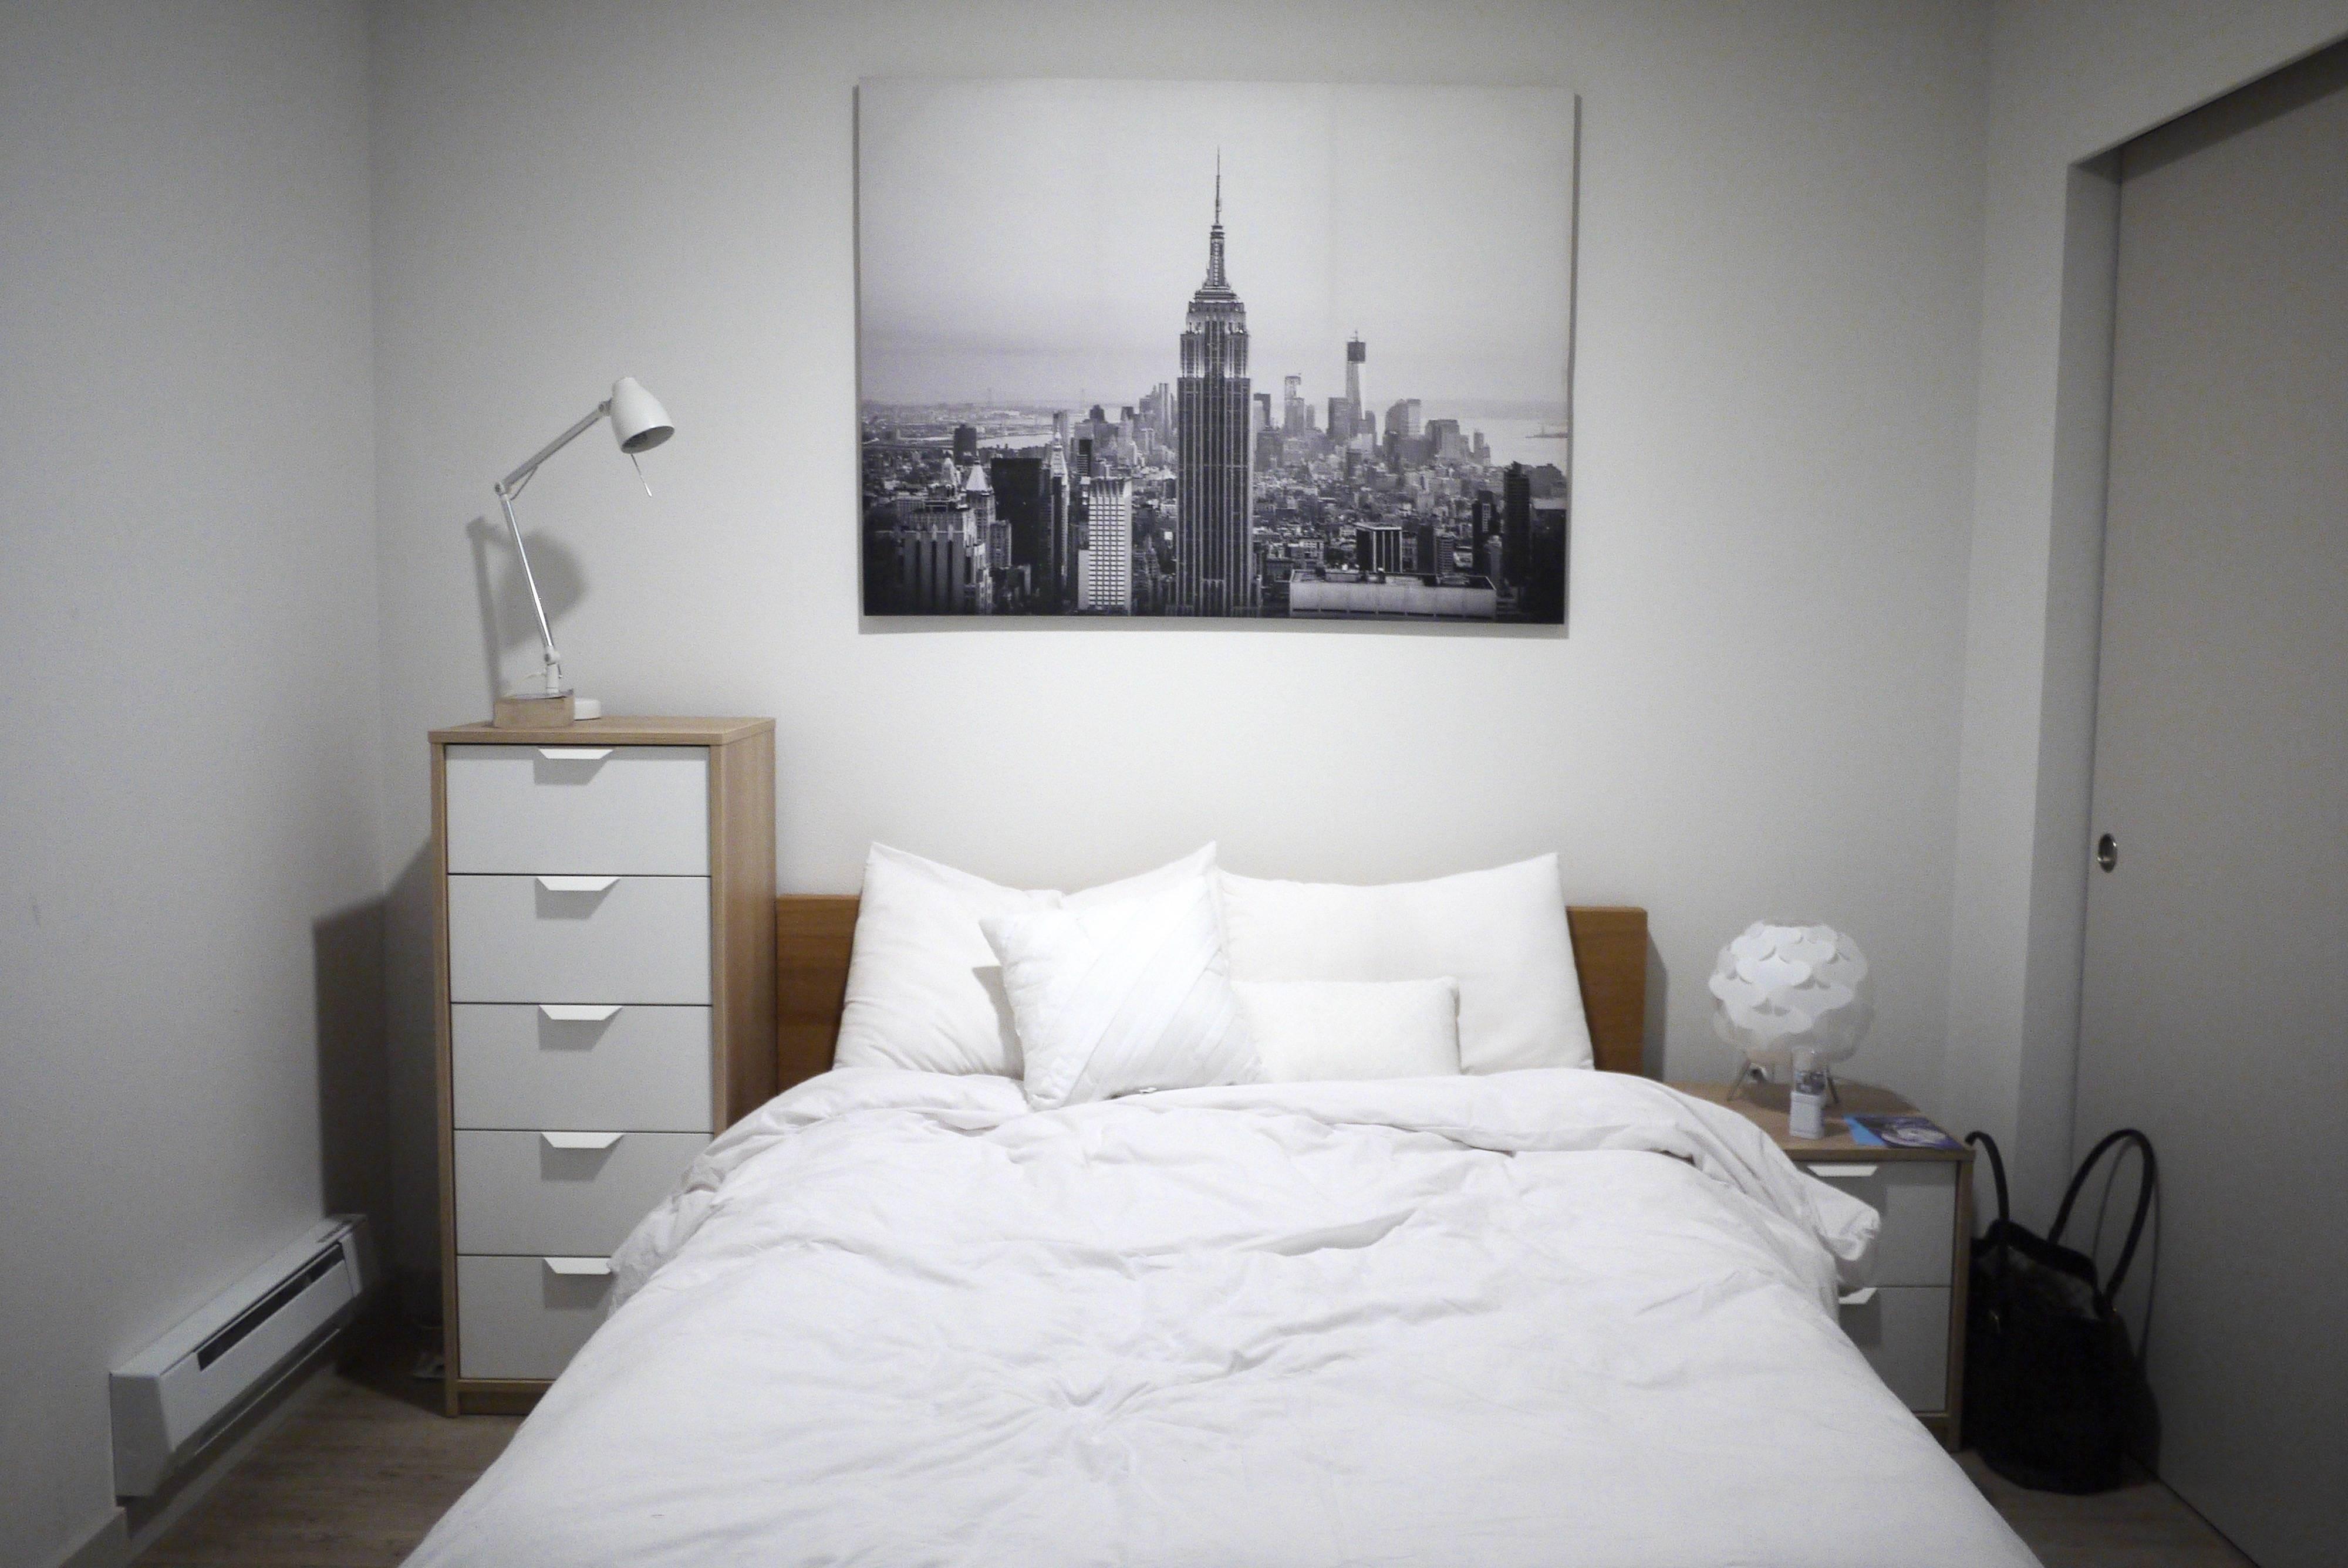 Single male bedroom design ideas